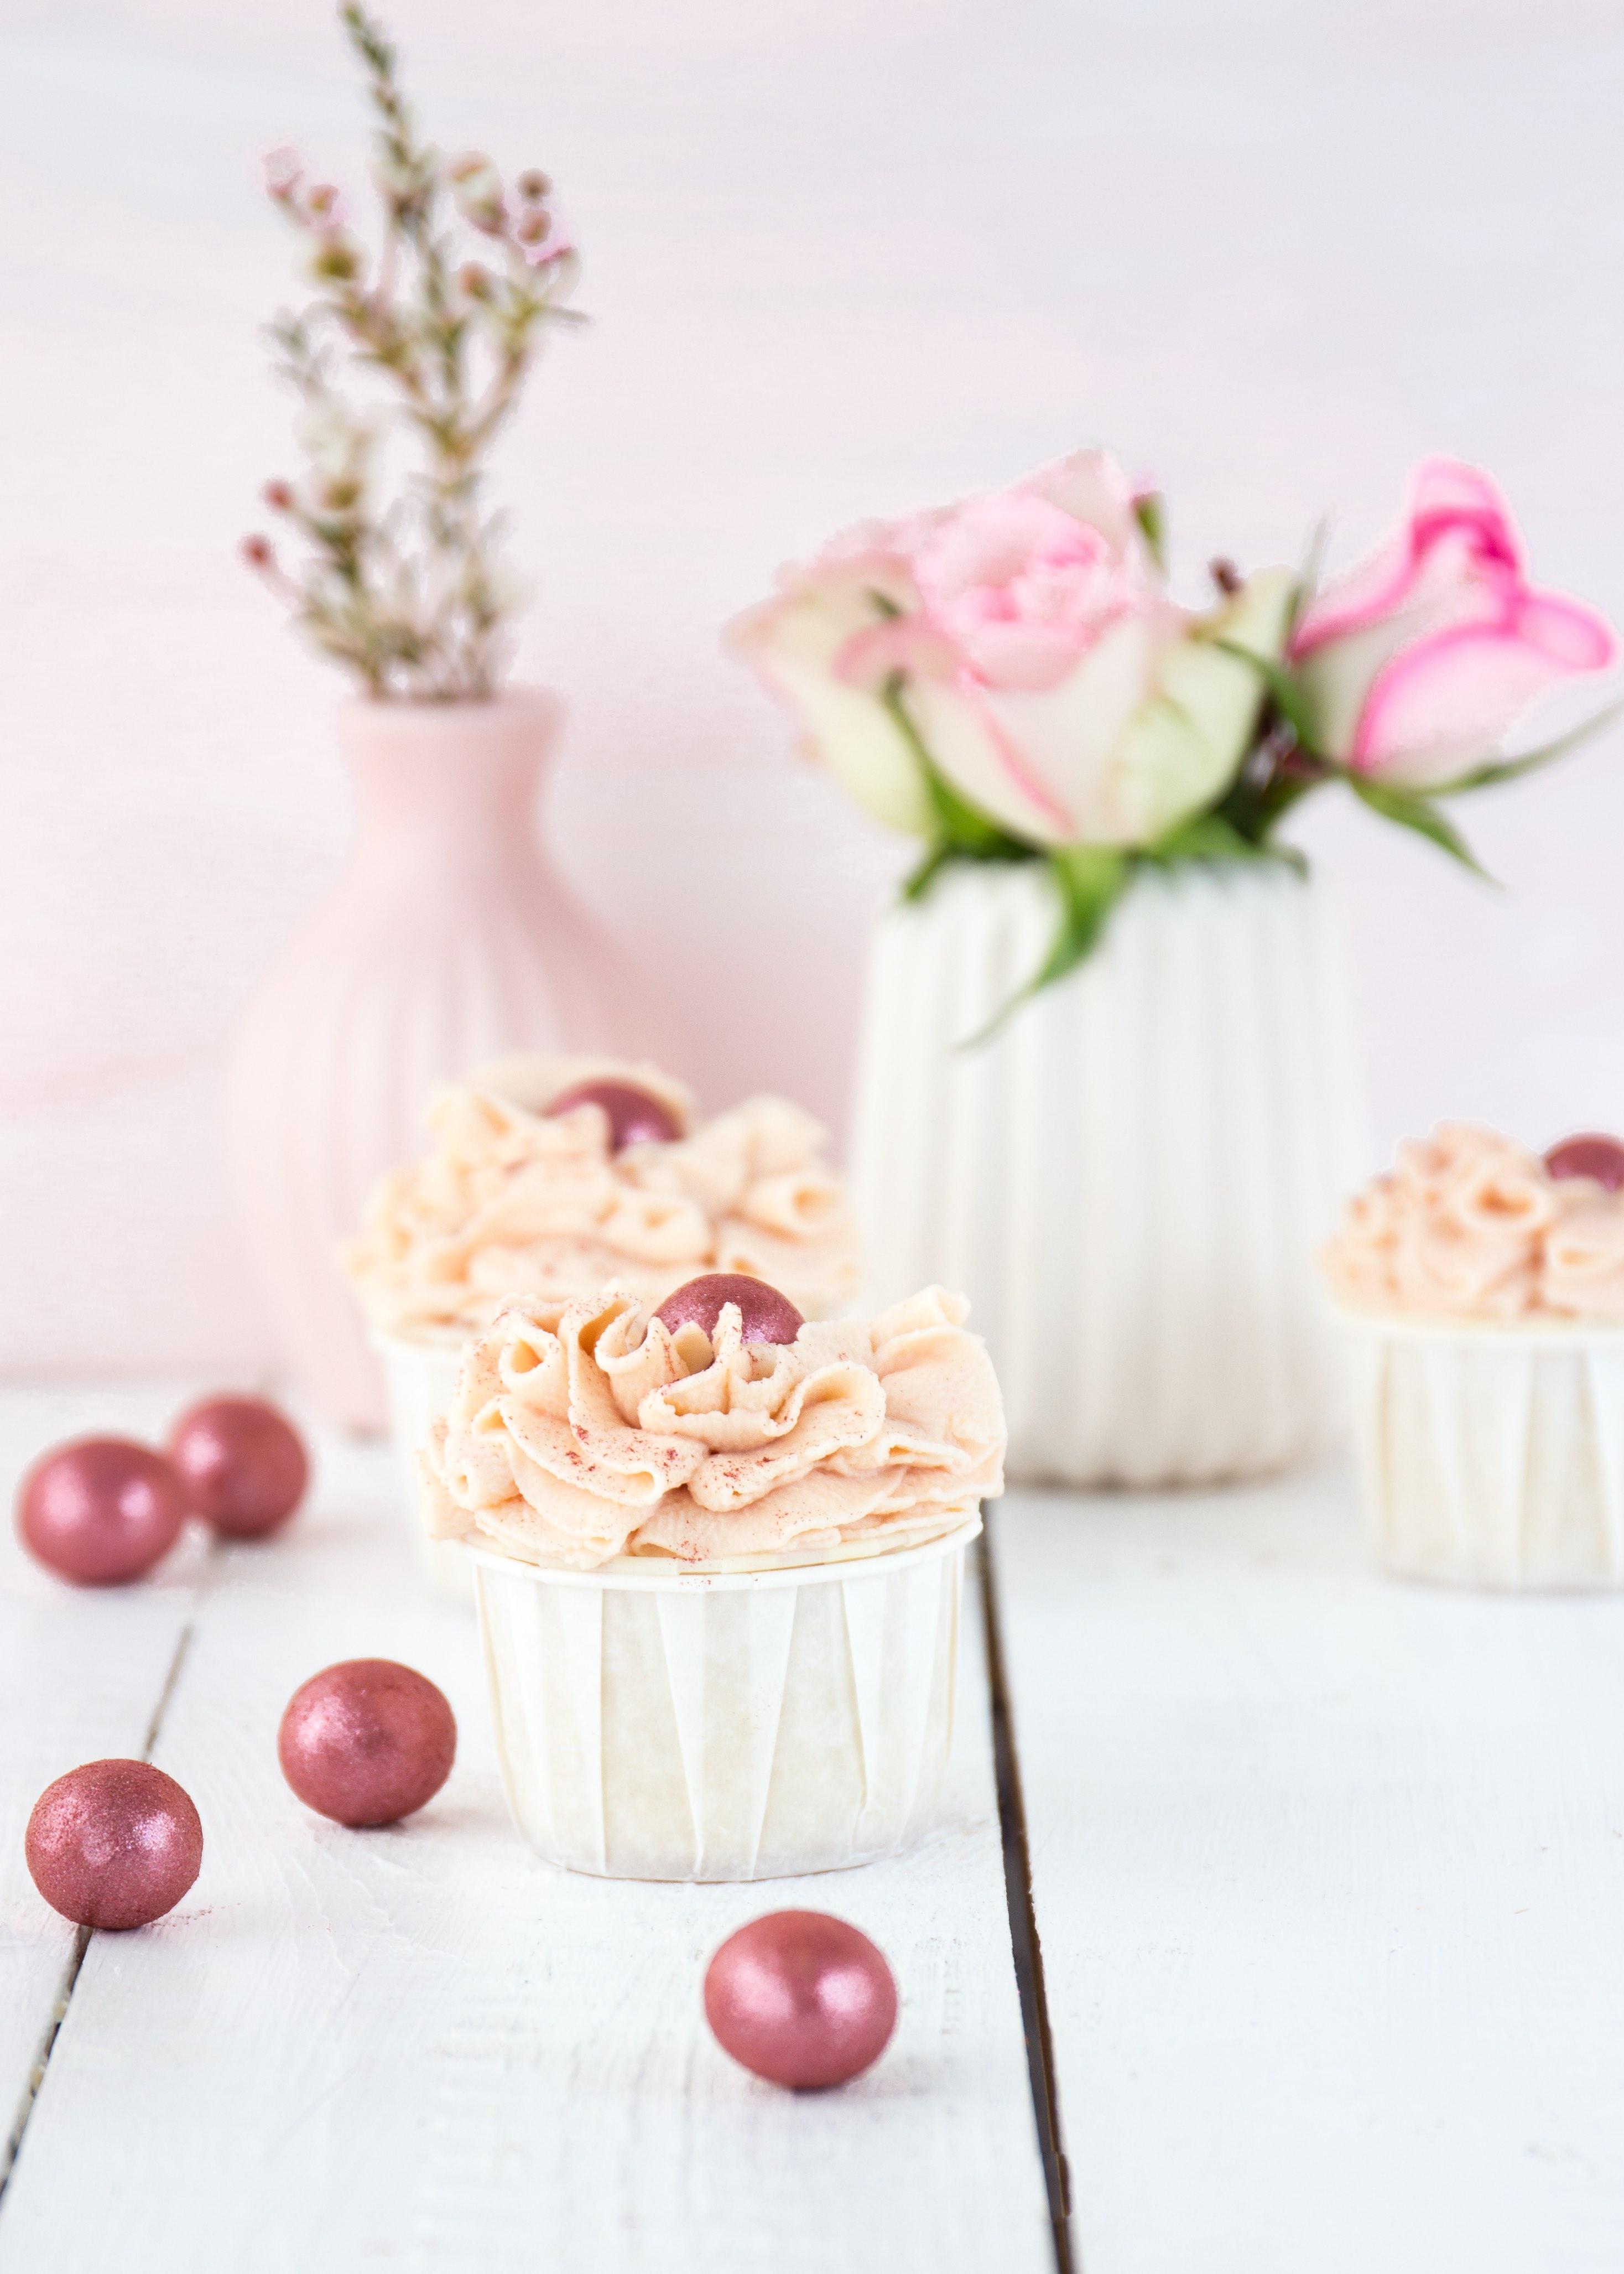 Apfel-Himbeer-Cupcakes